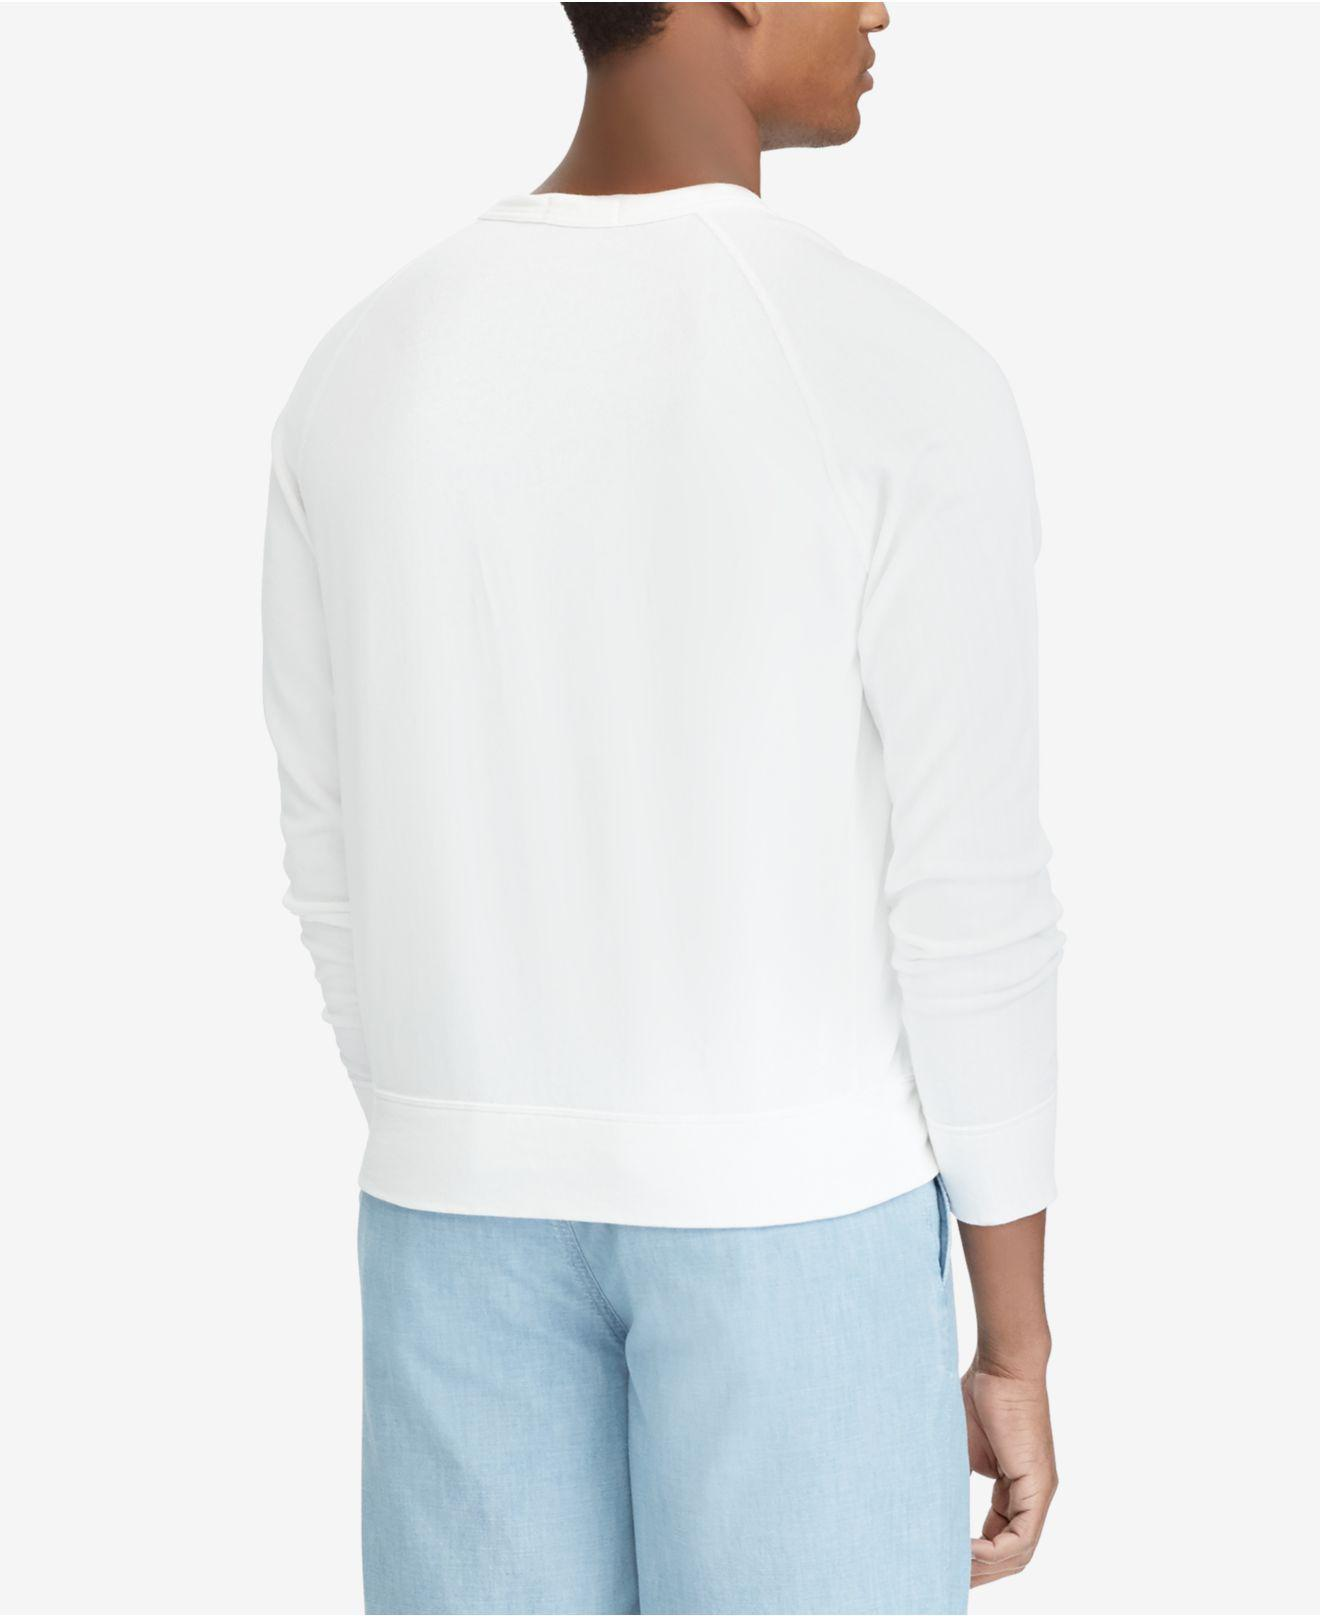 4fecb90c2d99 Lyst - Polo Ralph Lauren Spa Terry Sweatshirt in White for Men - Save 28%